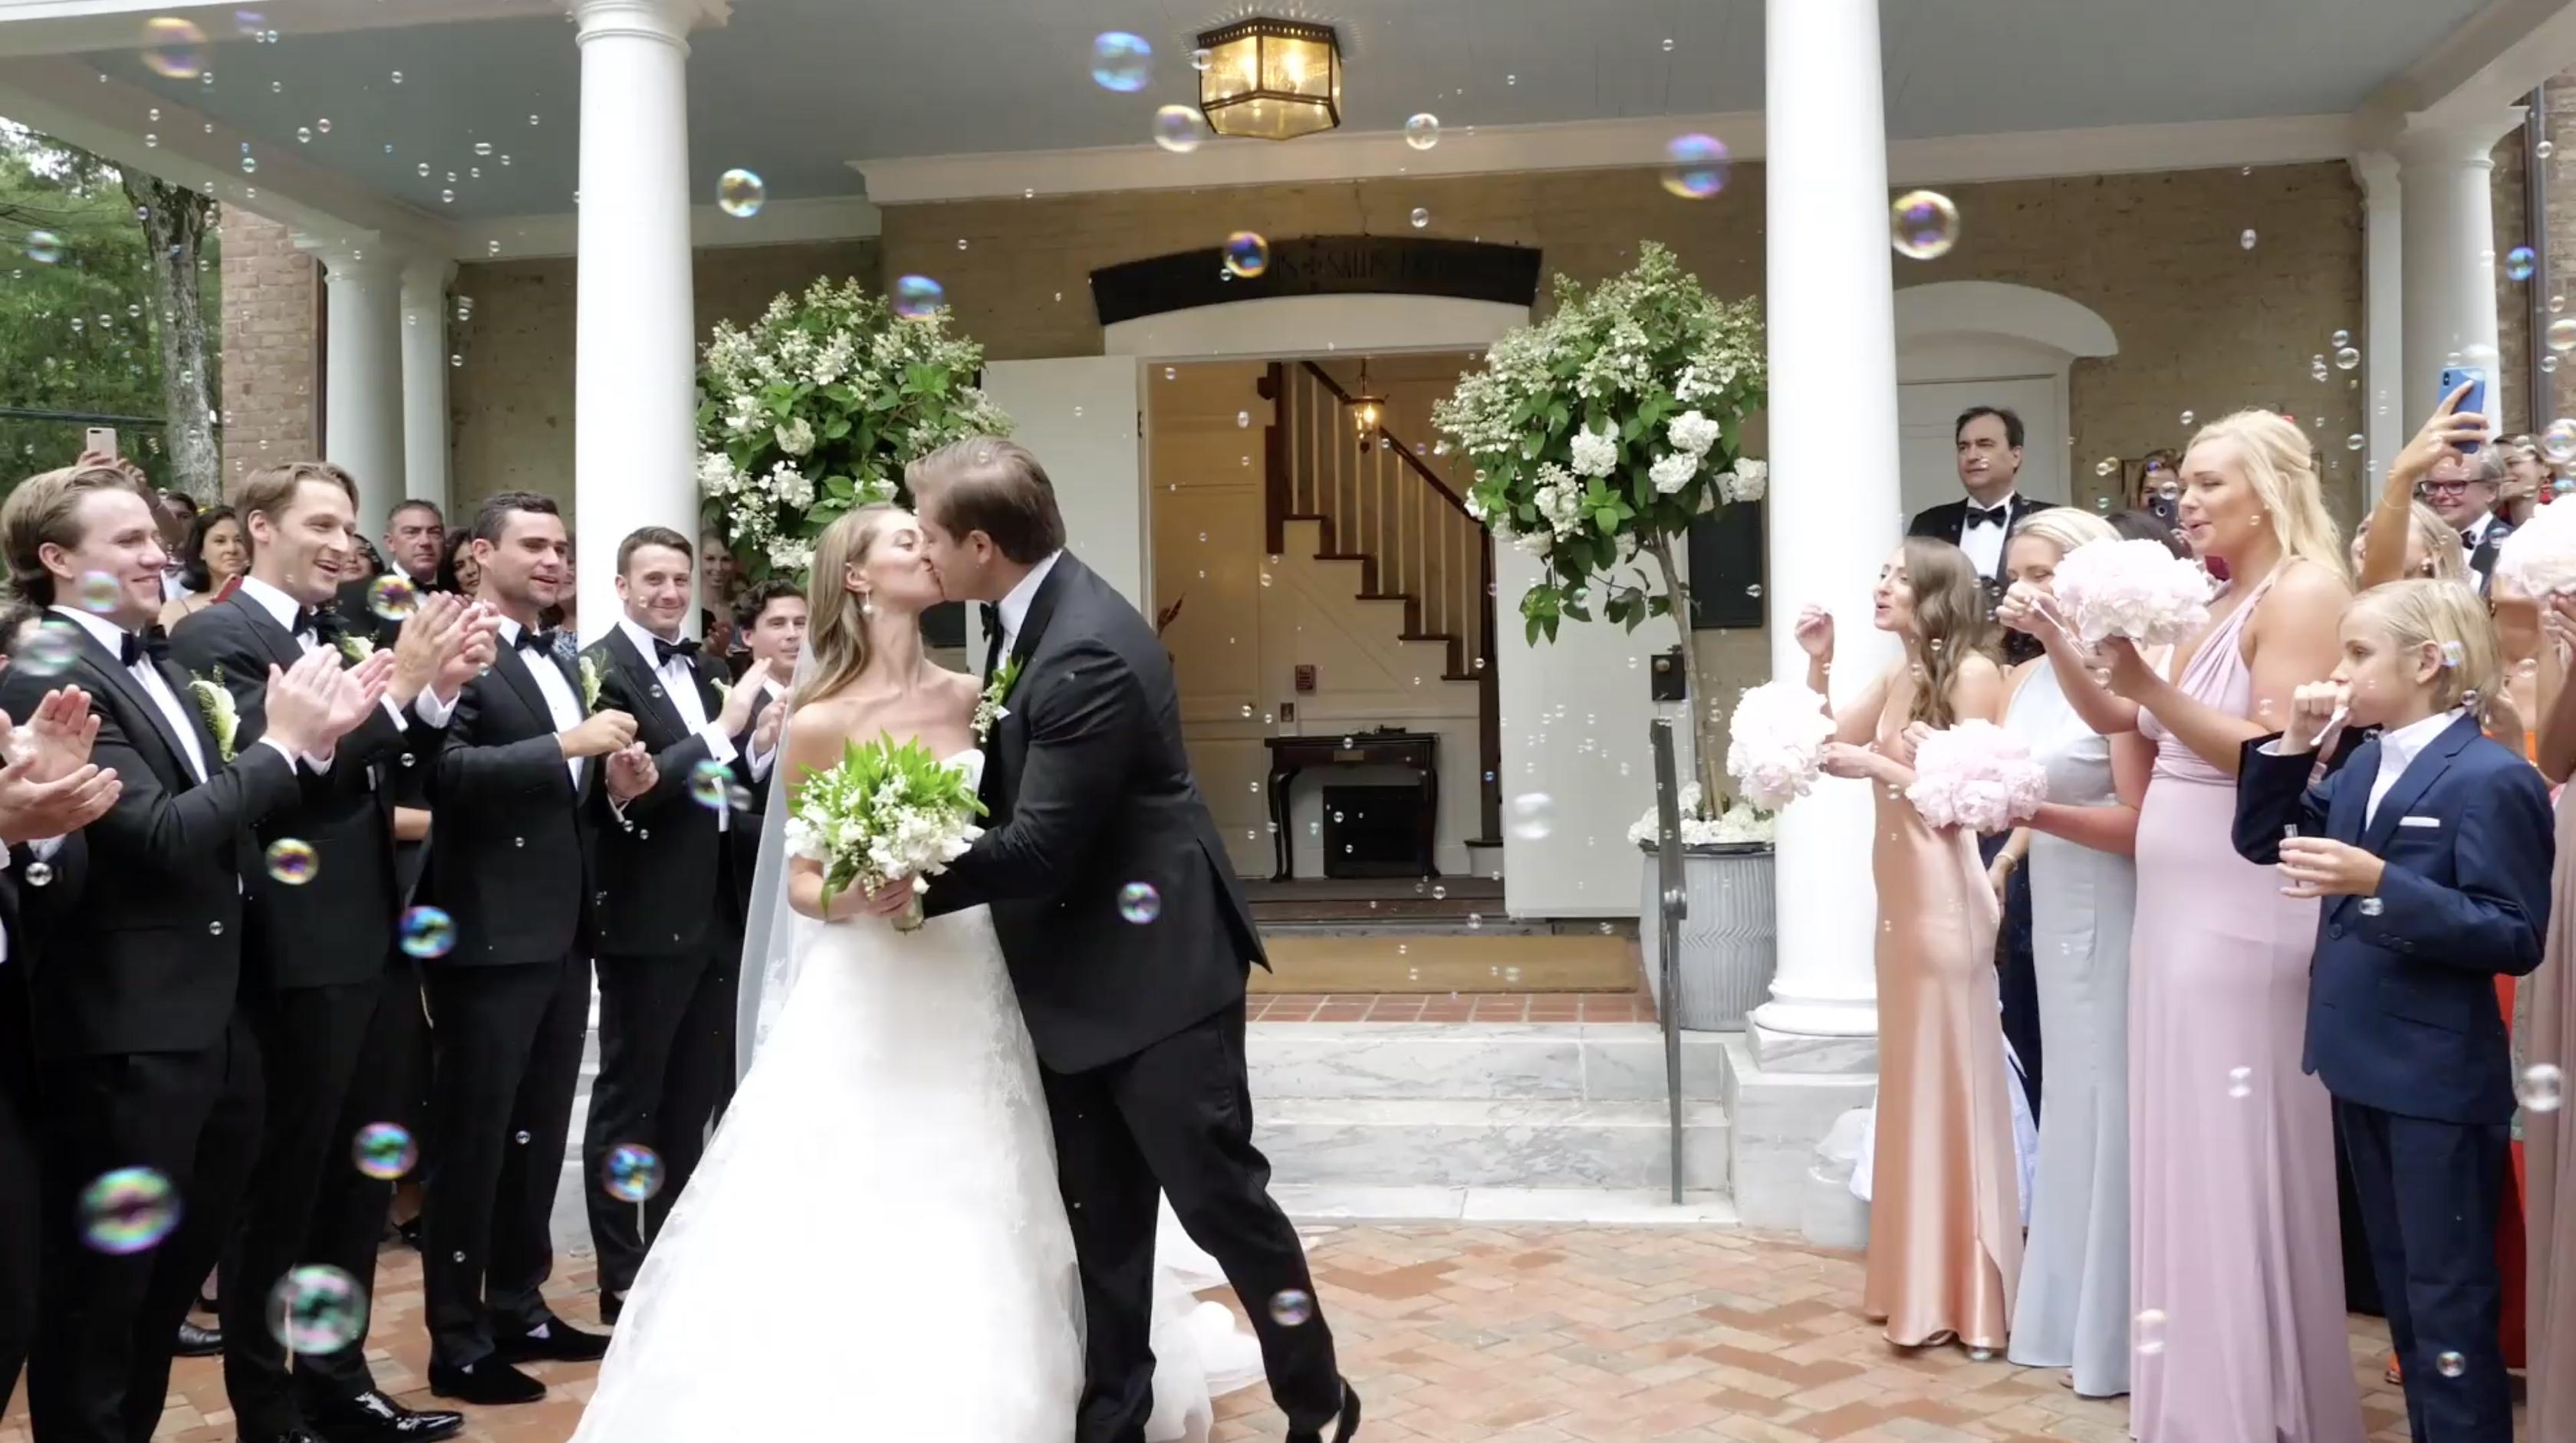 An Upstate NYC Wedding Video